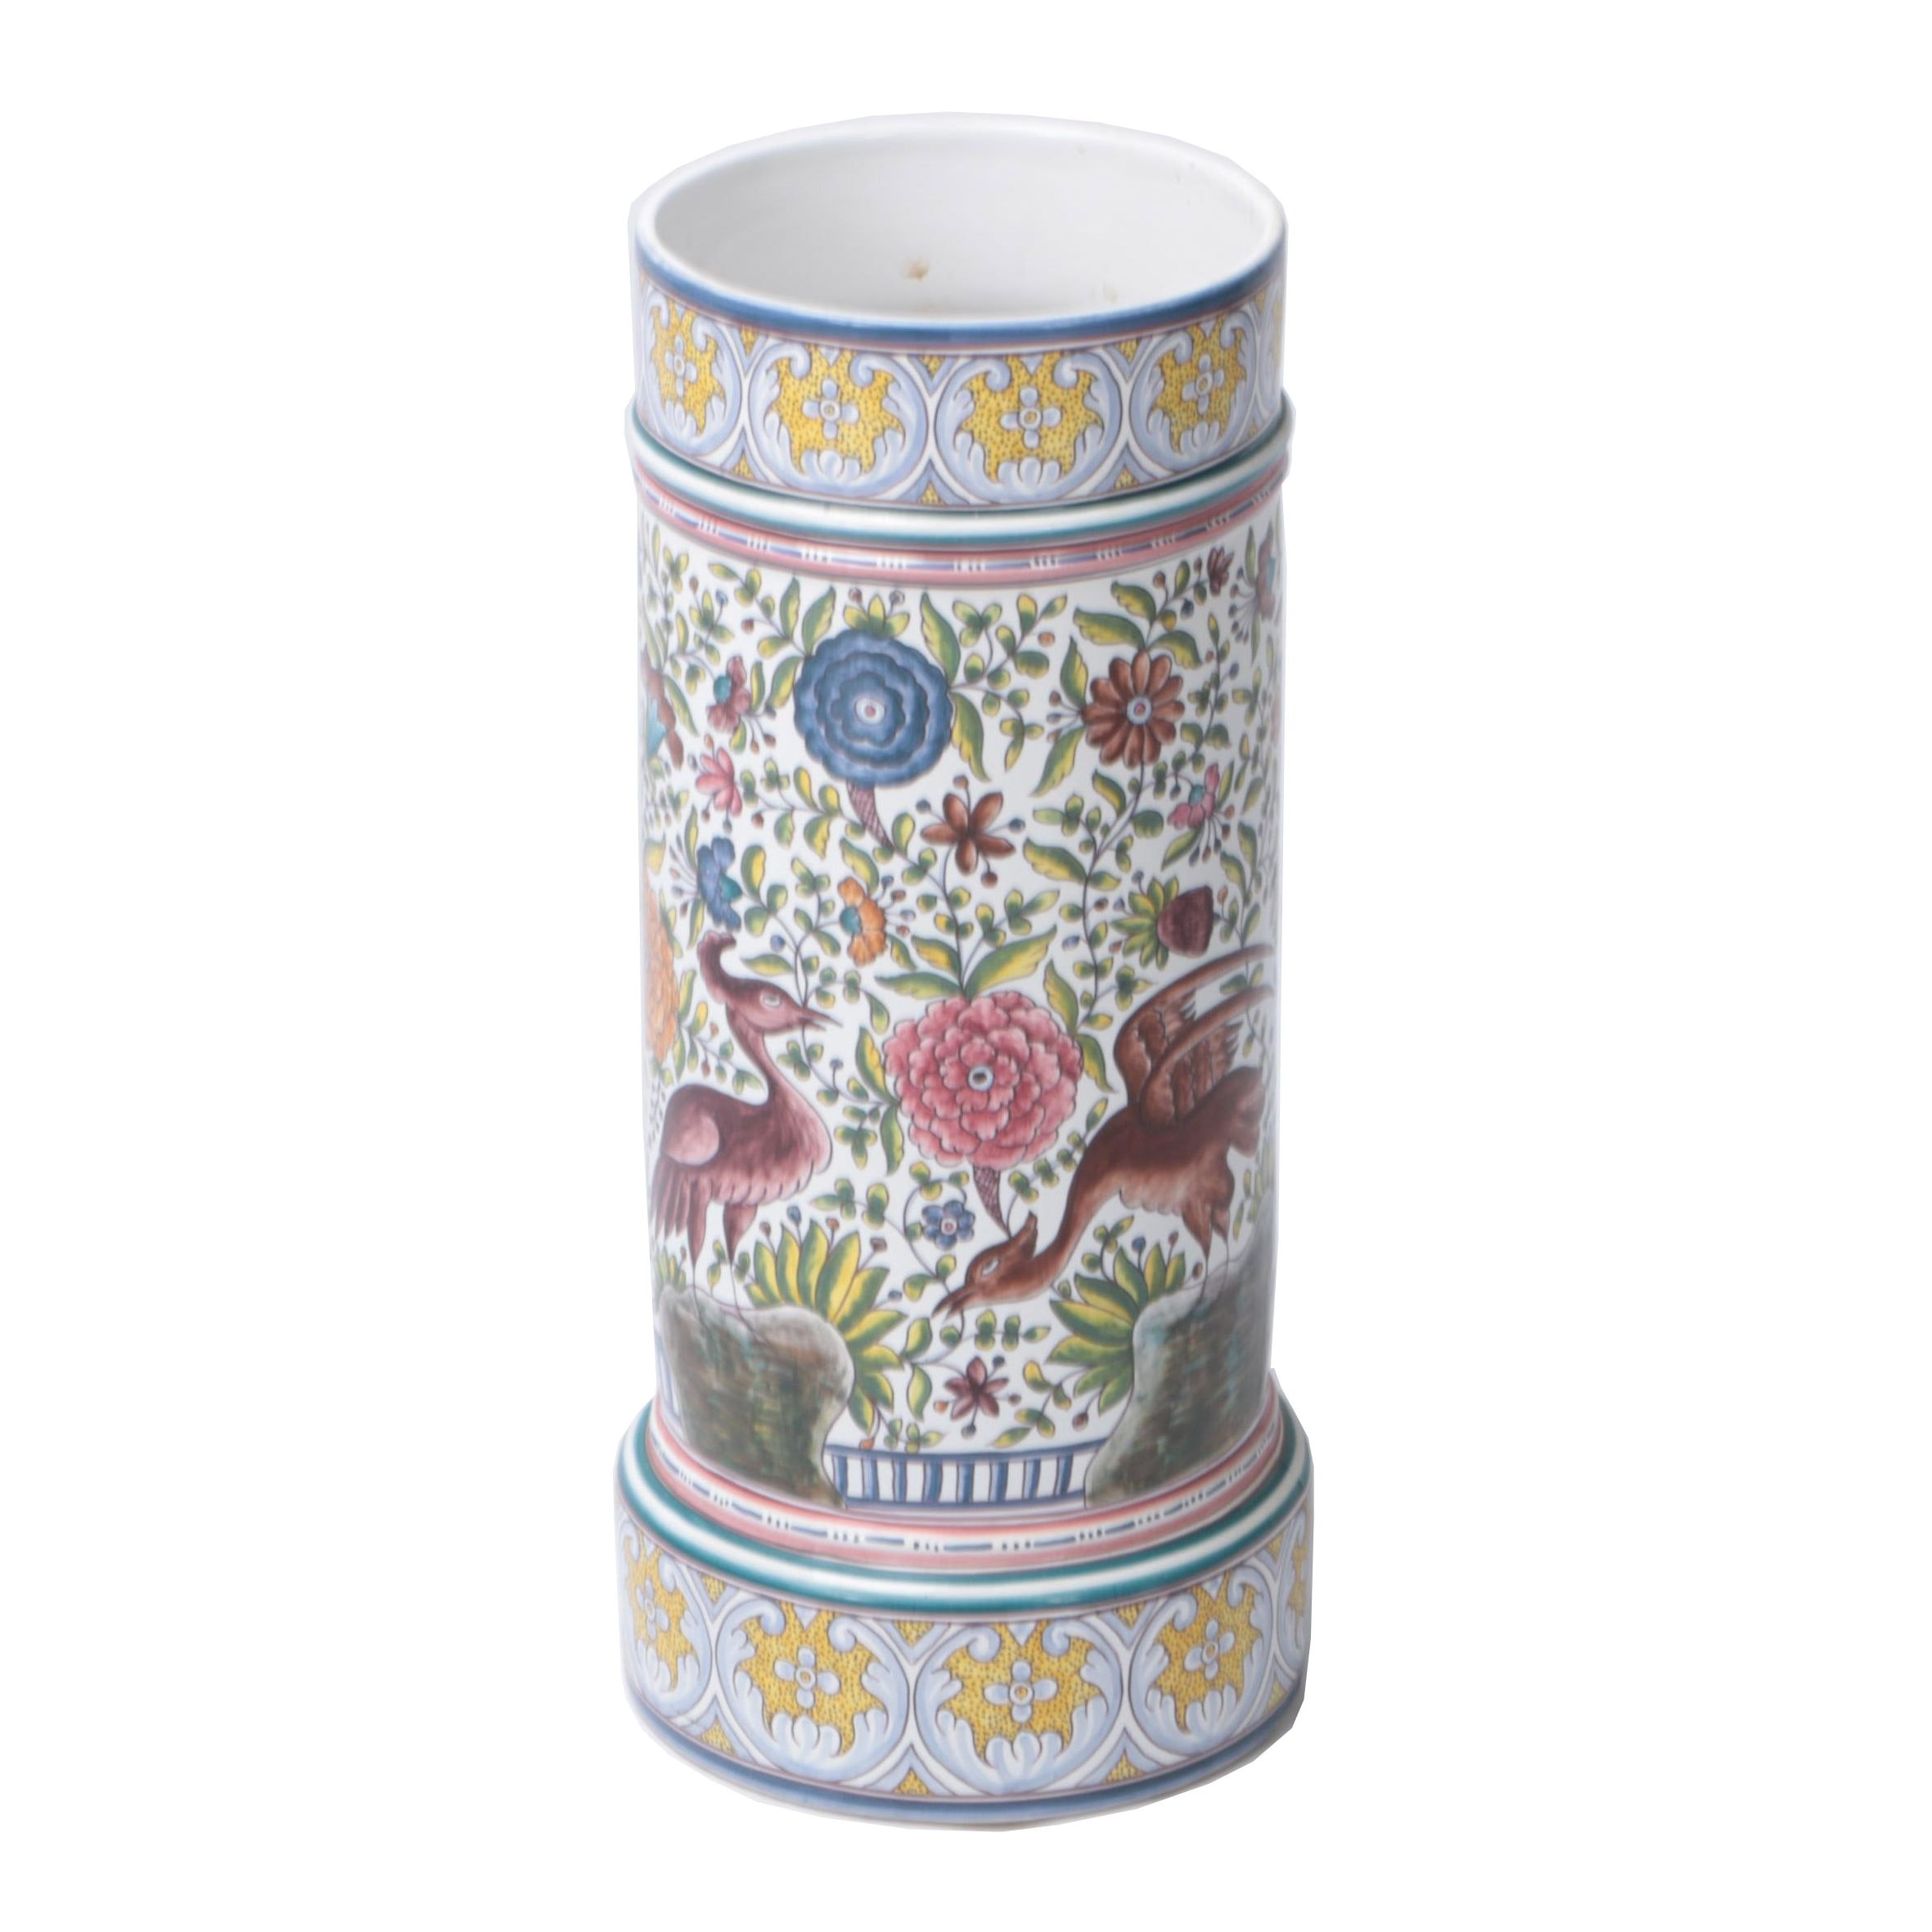 Estrela De Conimbriga Portugal Hand-Painted Ceramic Umbrella Stand